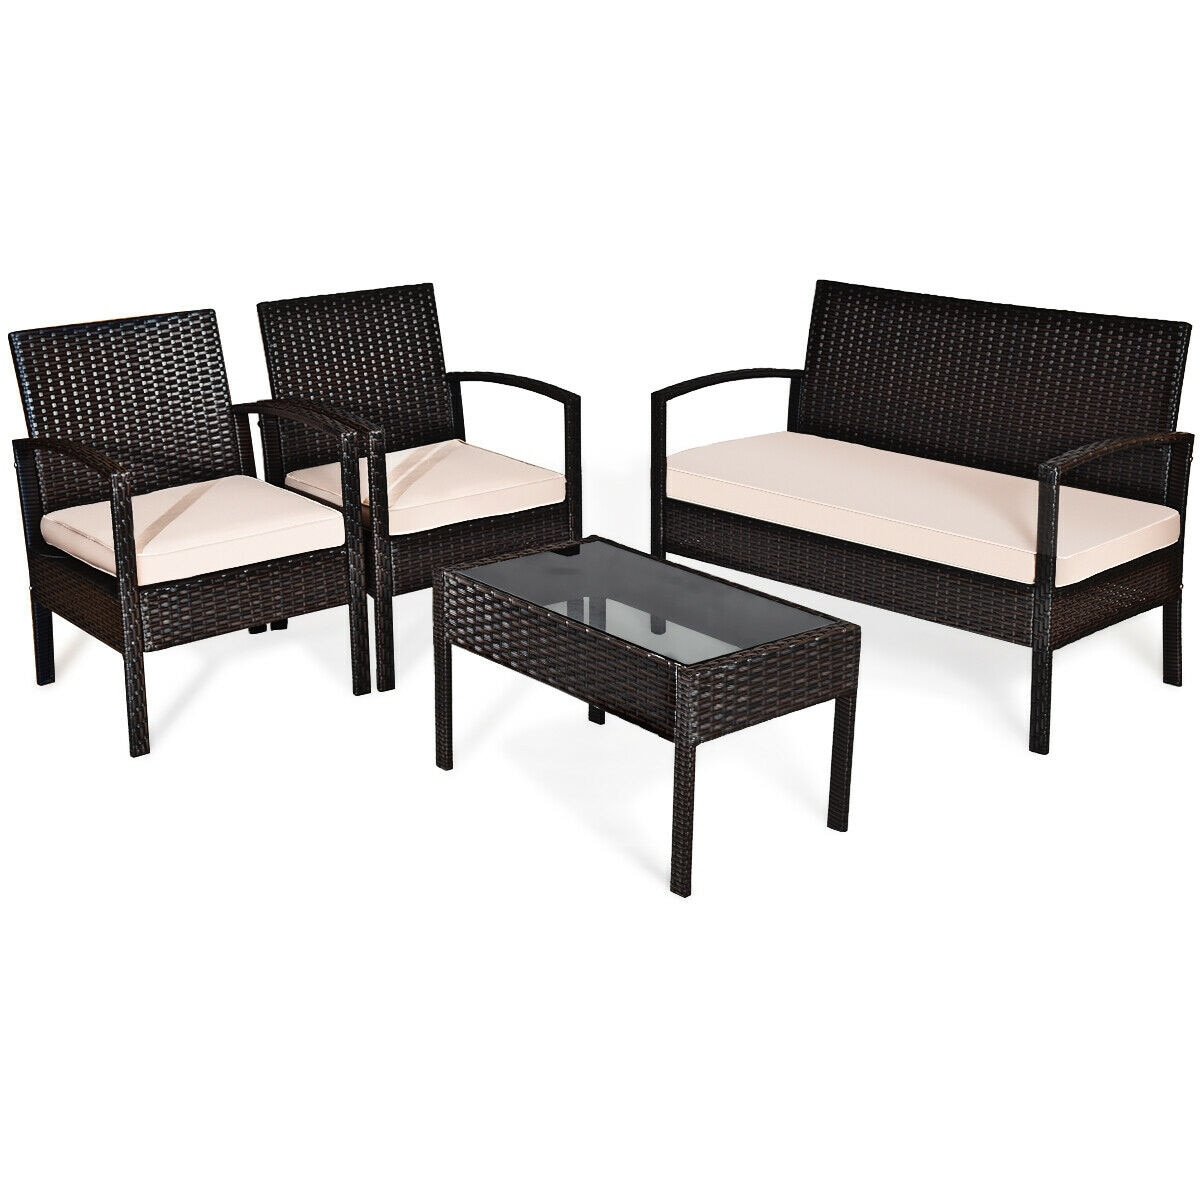 4 pcs patio furniture sets rattan chair wicker set outdoor bistro brown